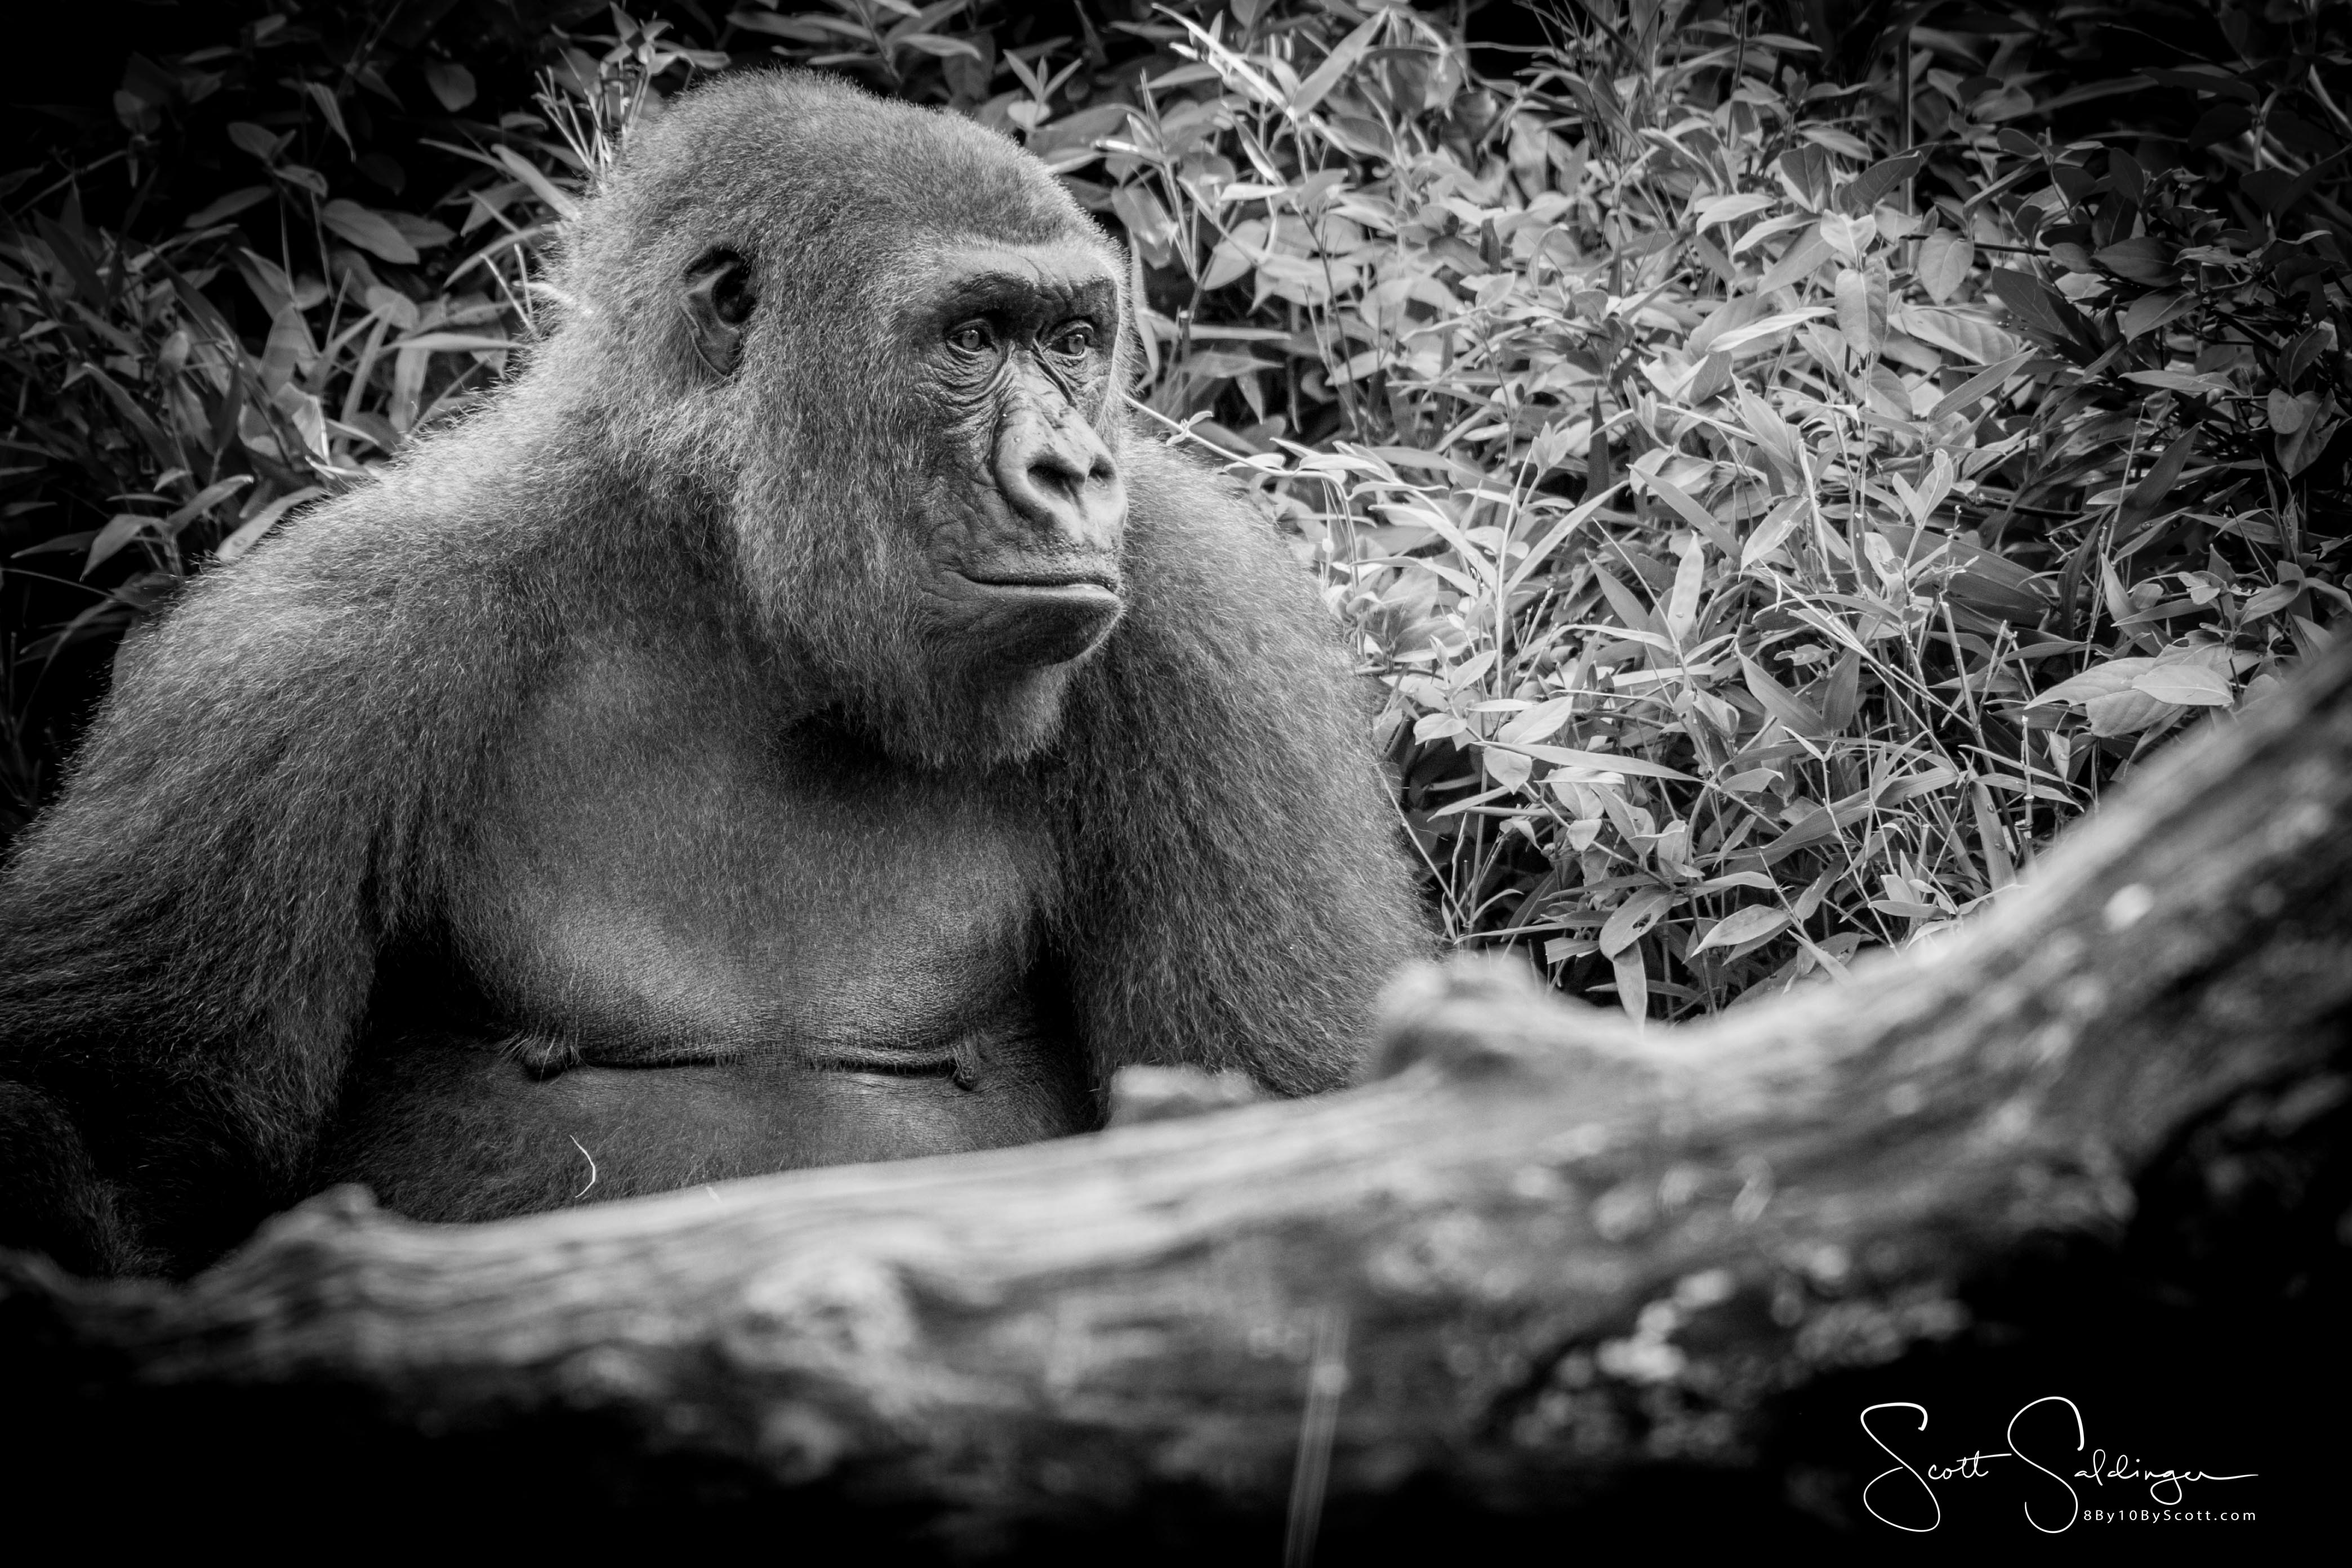 Apes-5920